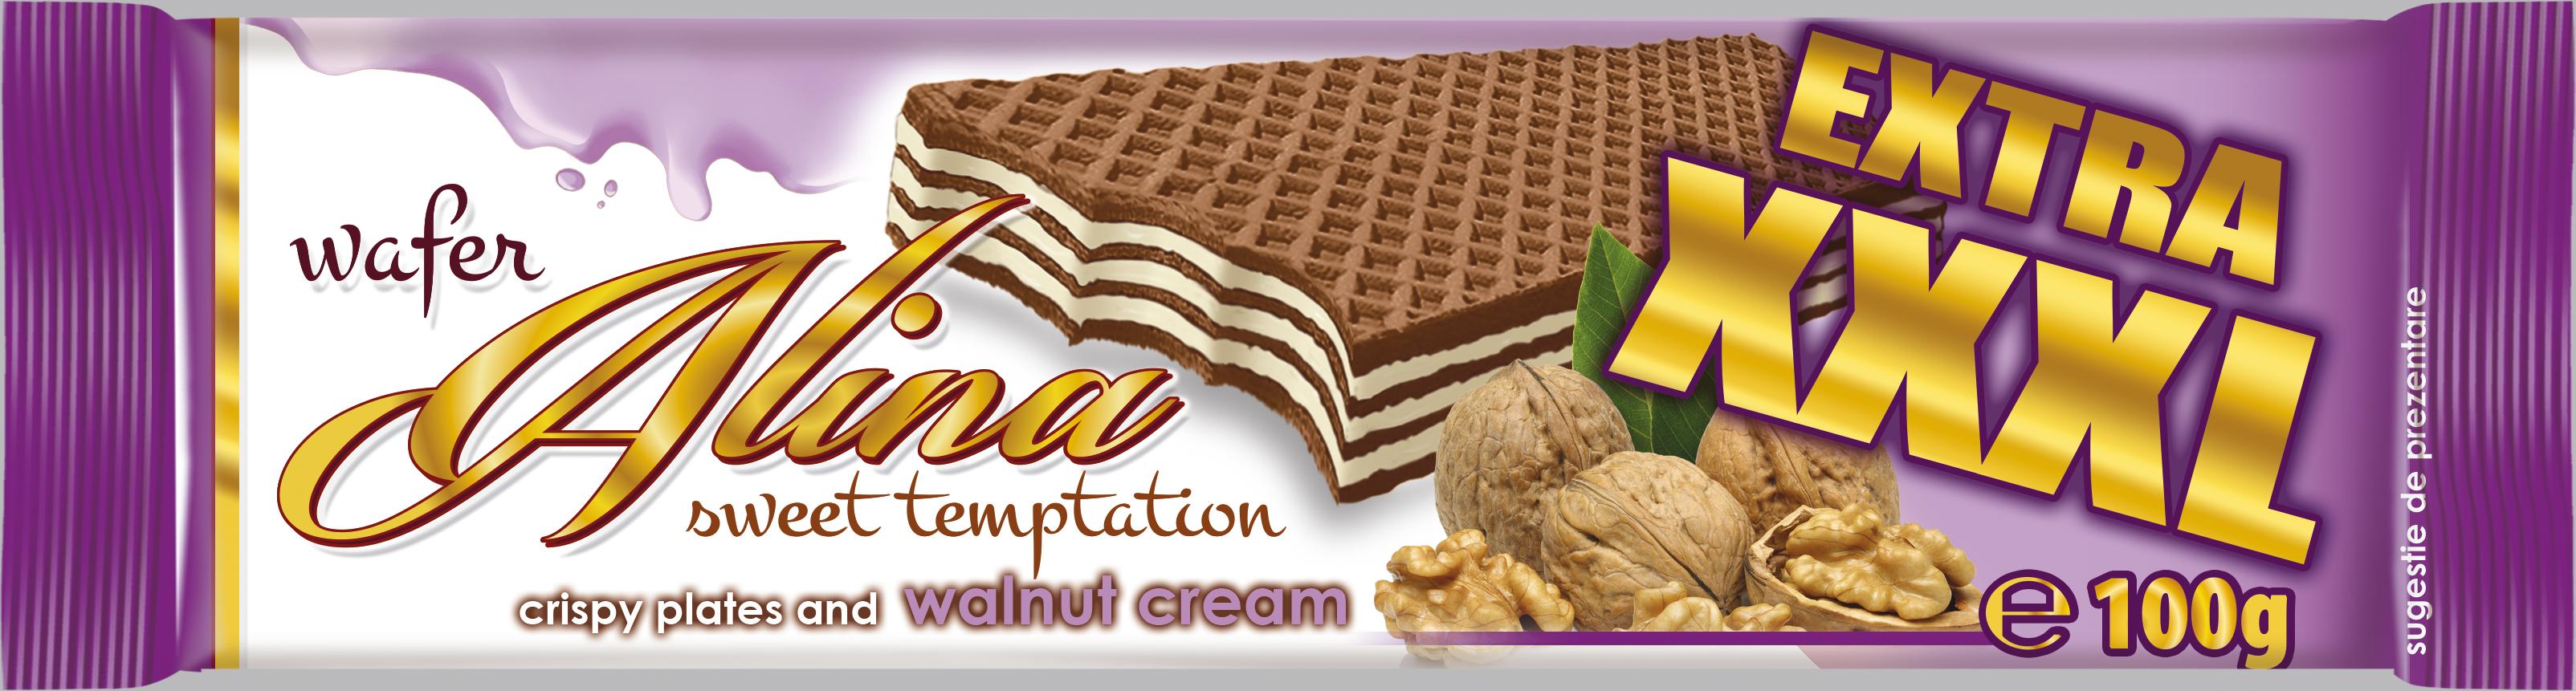 Alina EXTRA XXXL walnuts 100